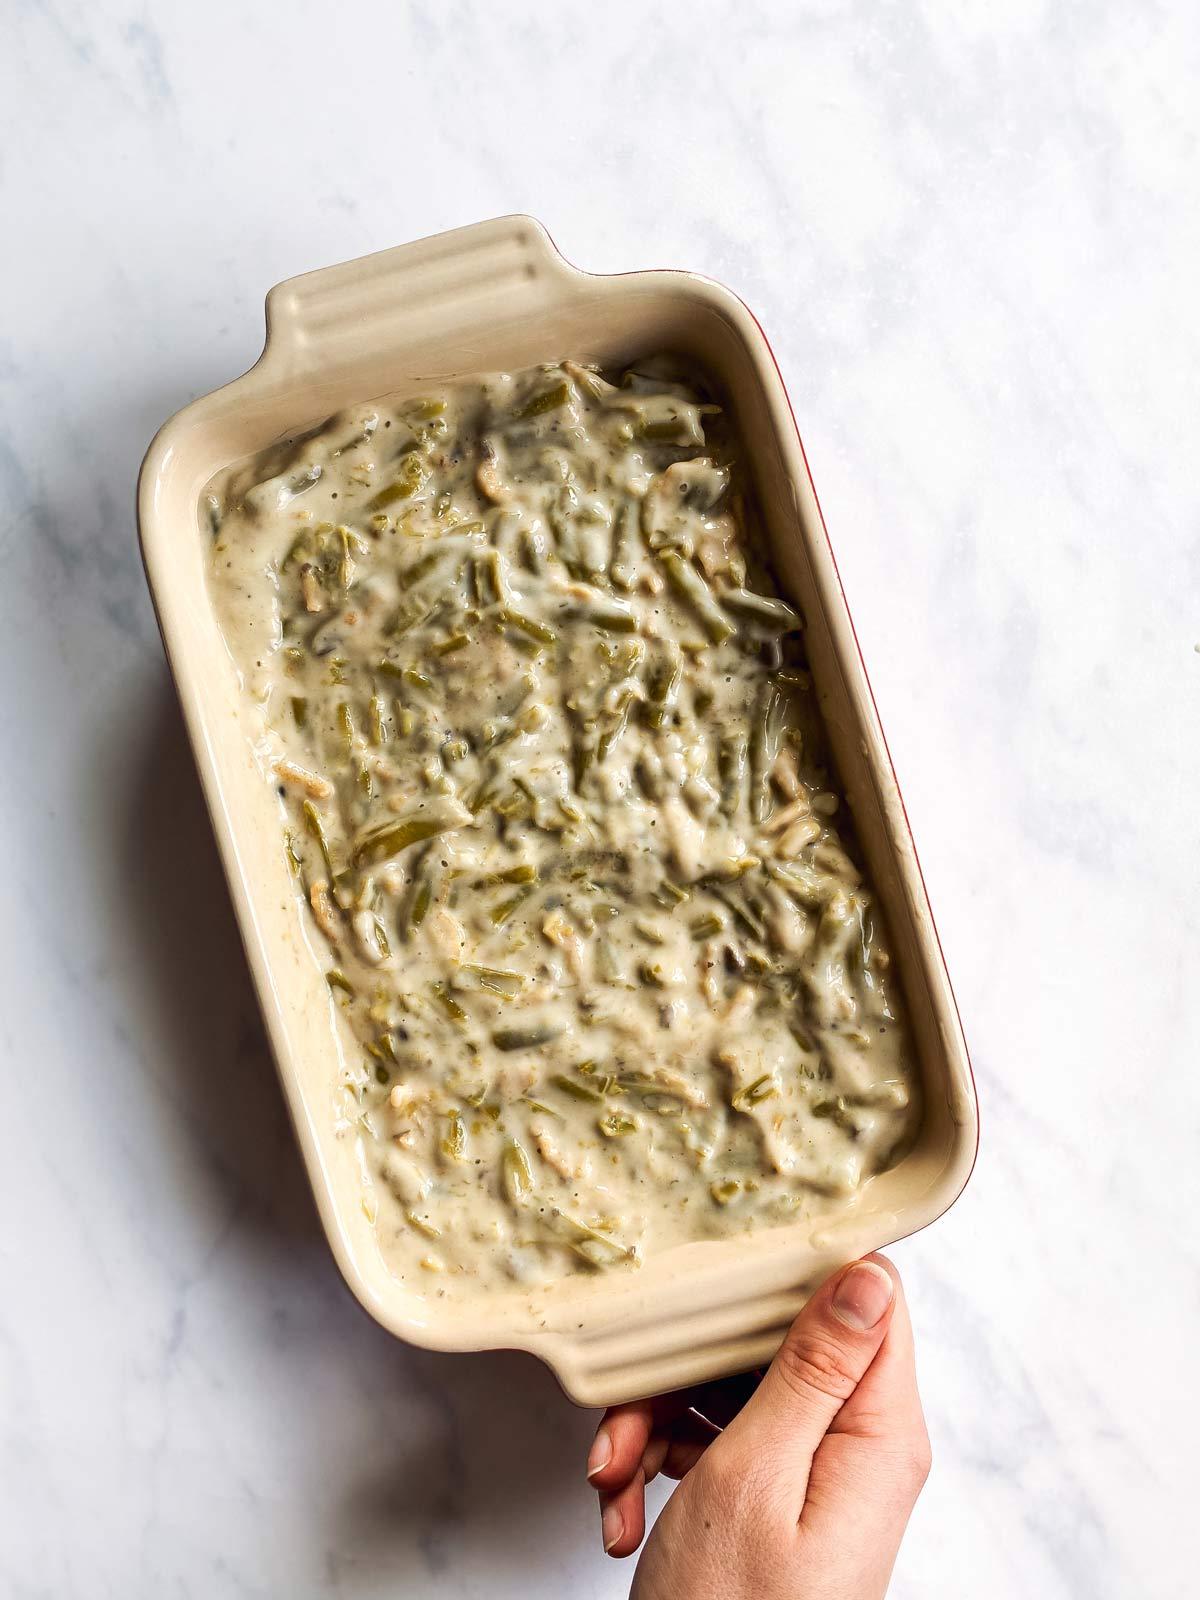 casserole dish with unbaked green bean casserole